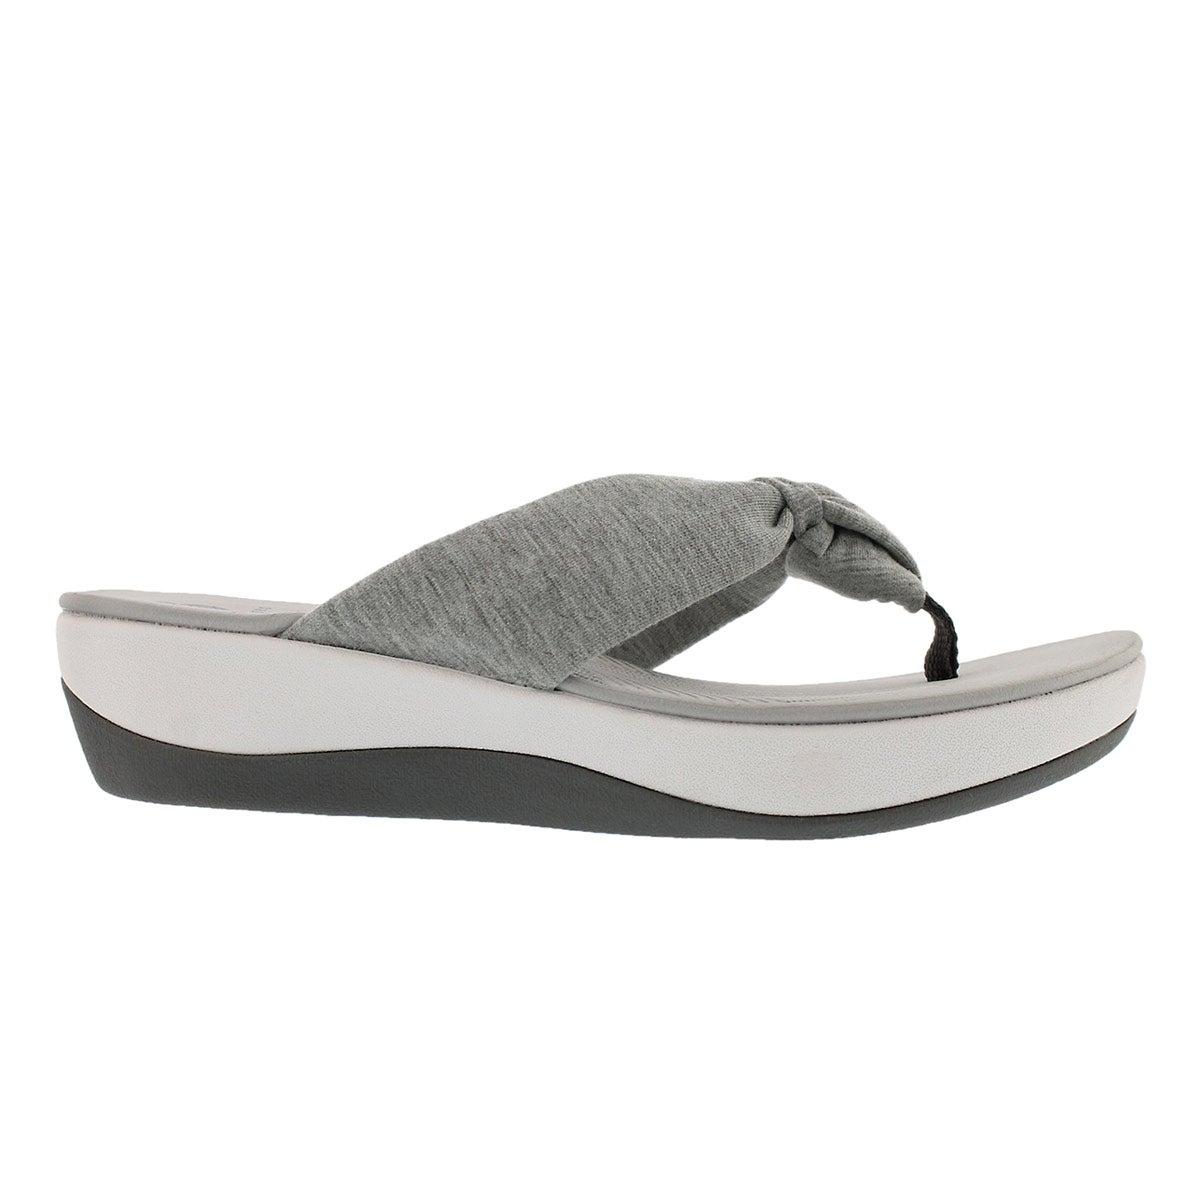 Lds Arla Glison grey thong wedge sandal